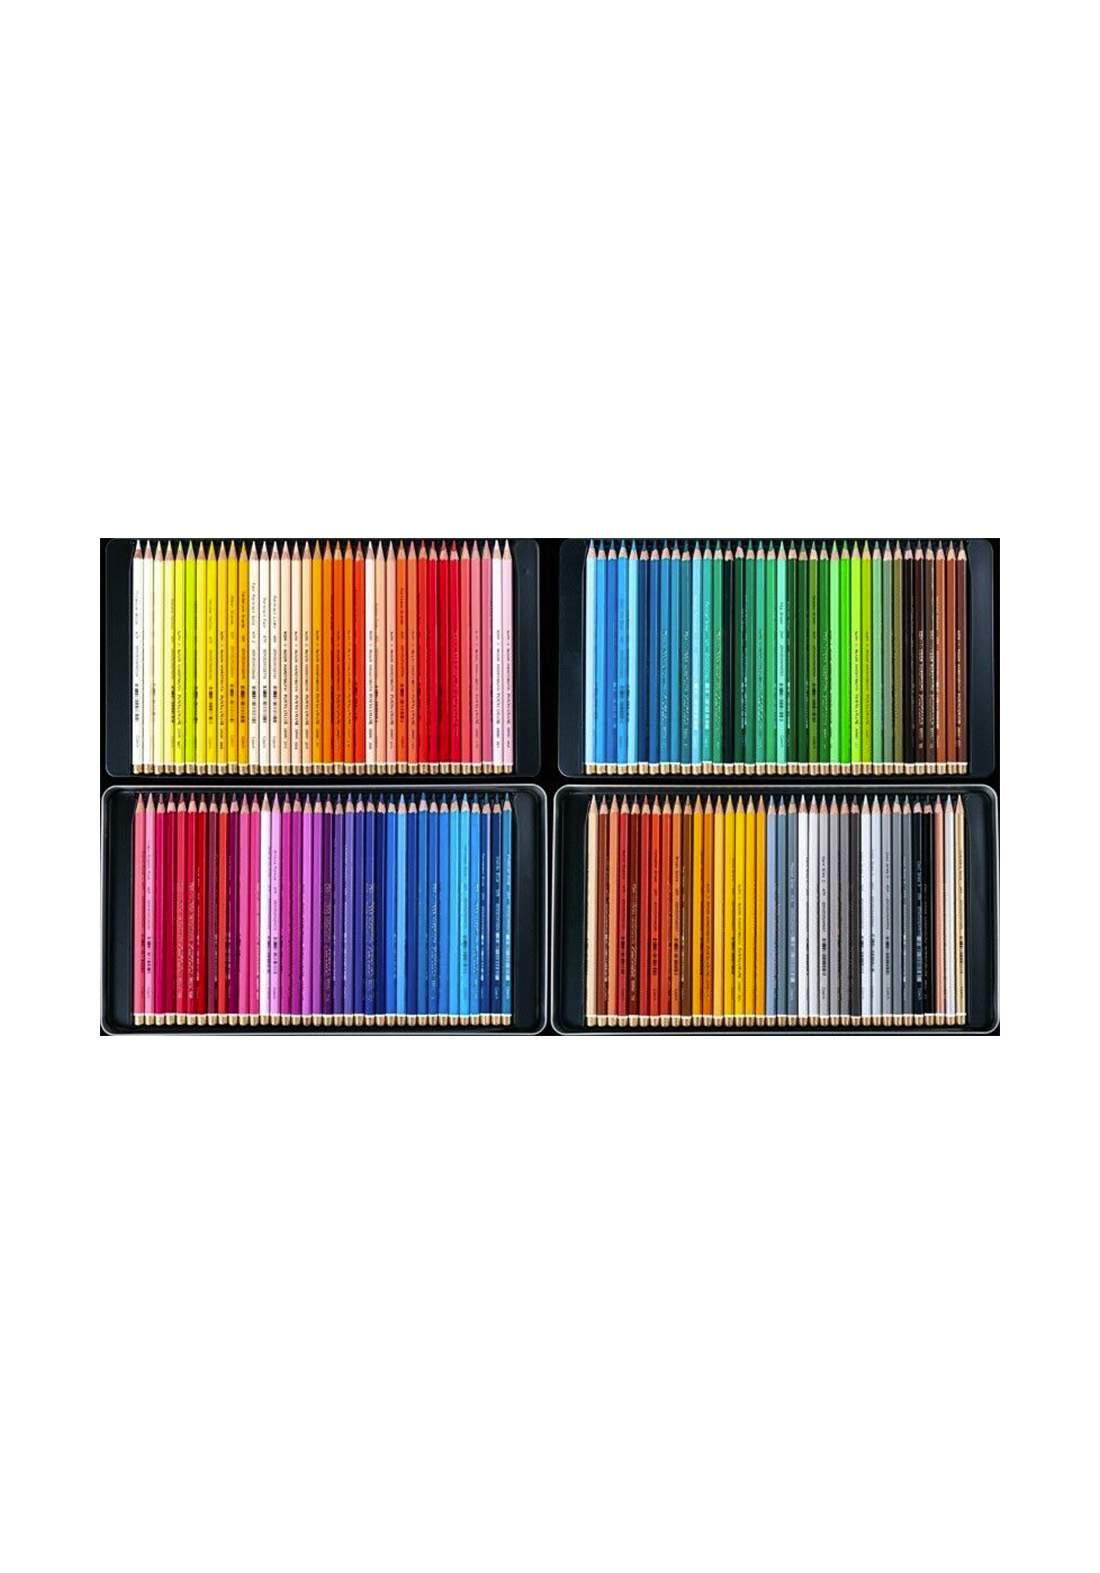 Koh-I-Noor  Polycolor Coloured Pencils 144 In 2 Metal Boxes سيت ألوان خشبية 144 لون